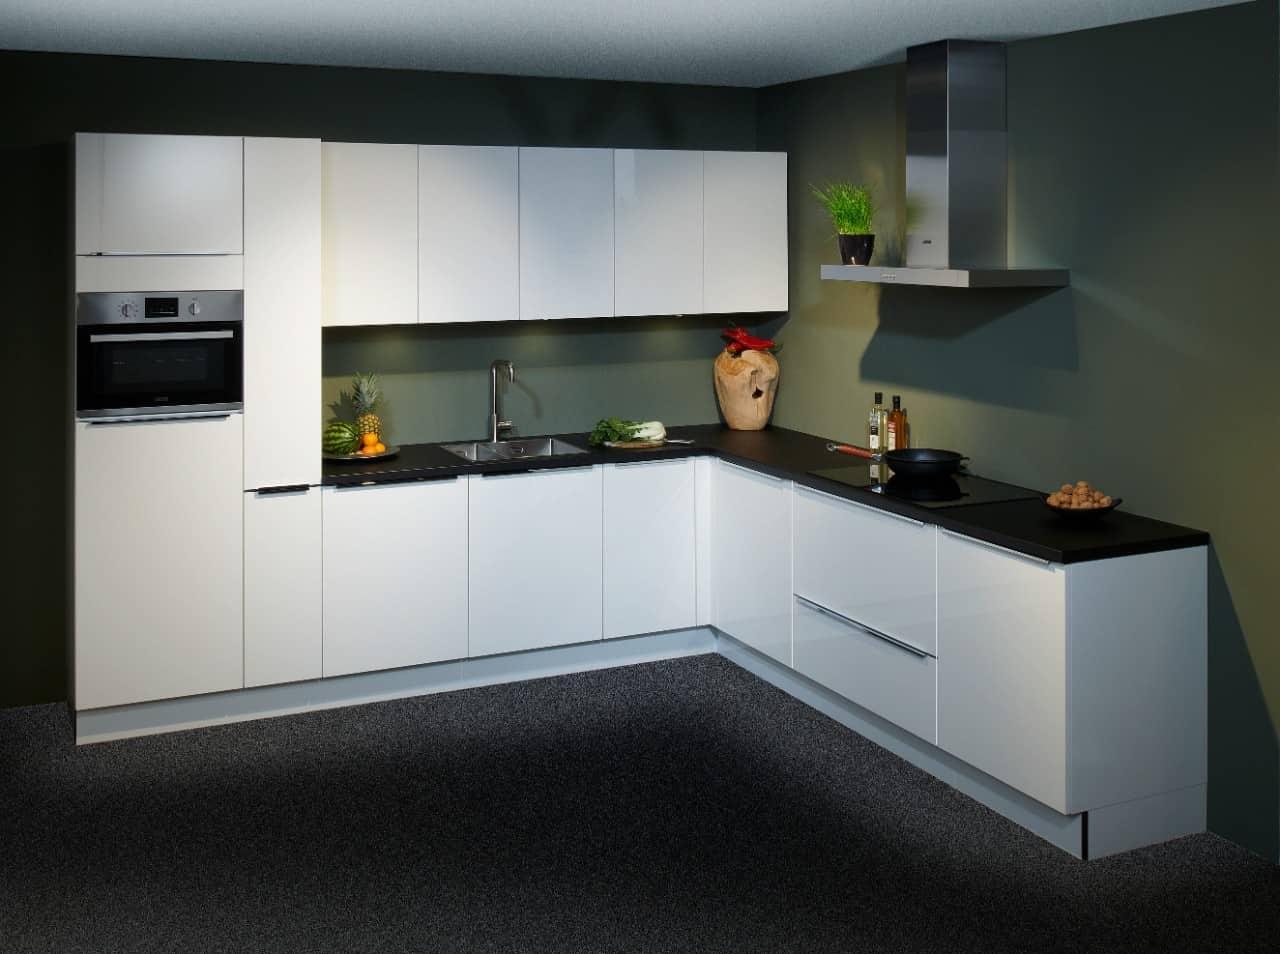 hoogglans wit keuken uit voorraad